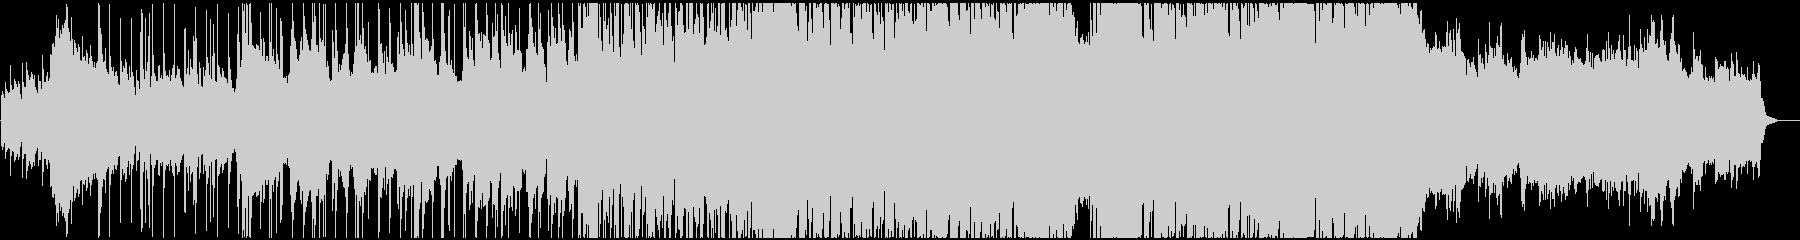 Fantastic Illusionの未再生の波形